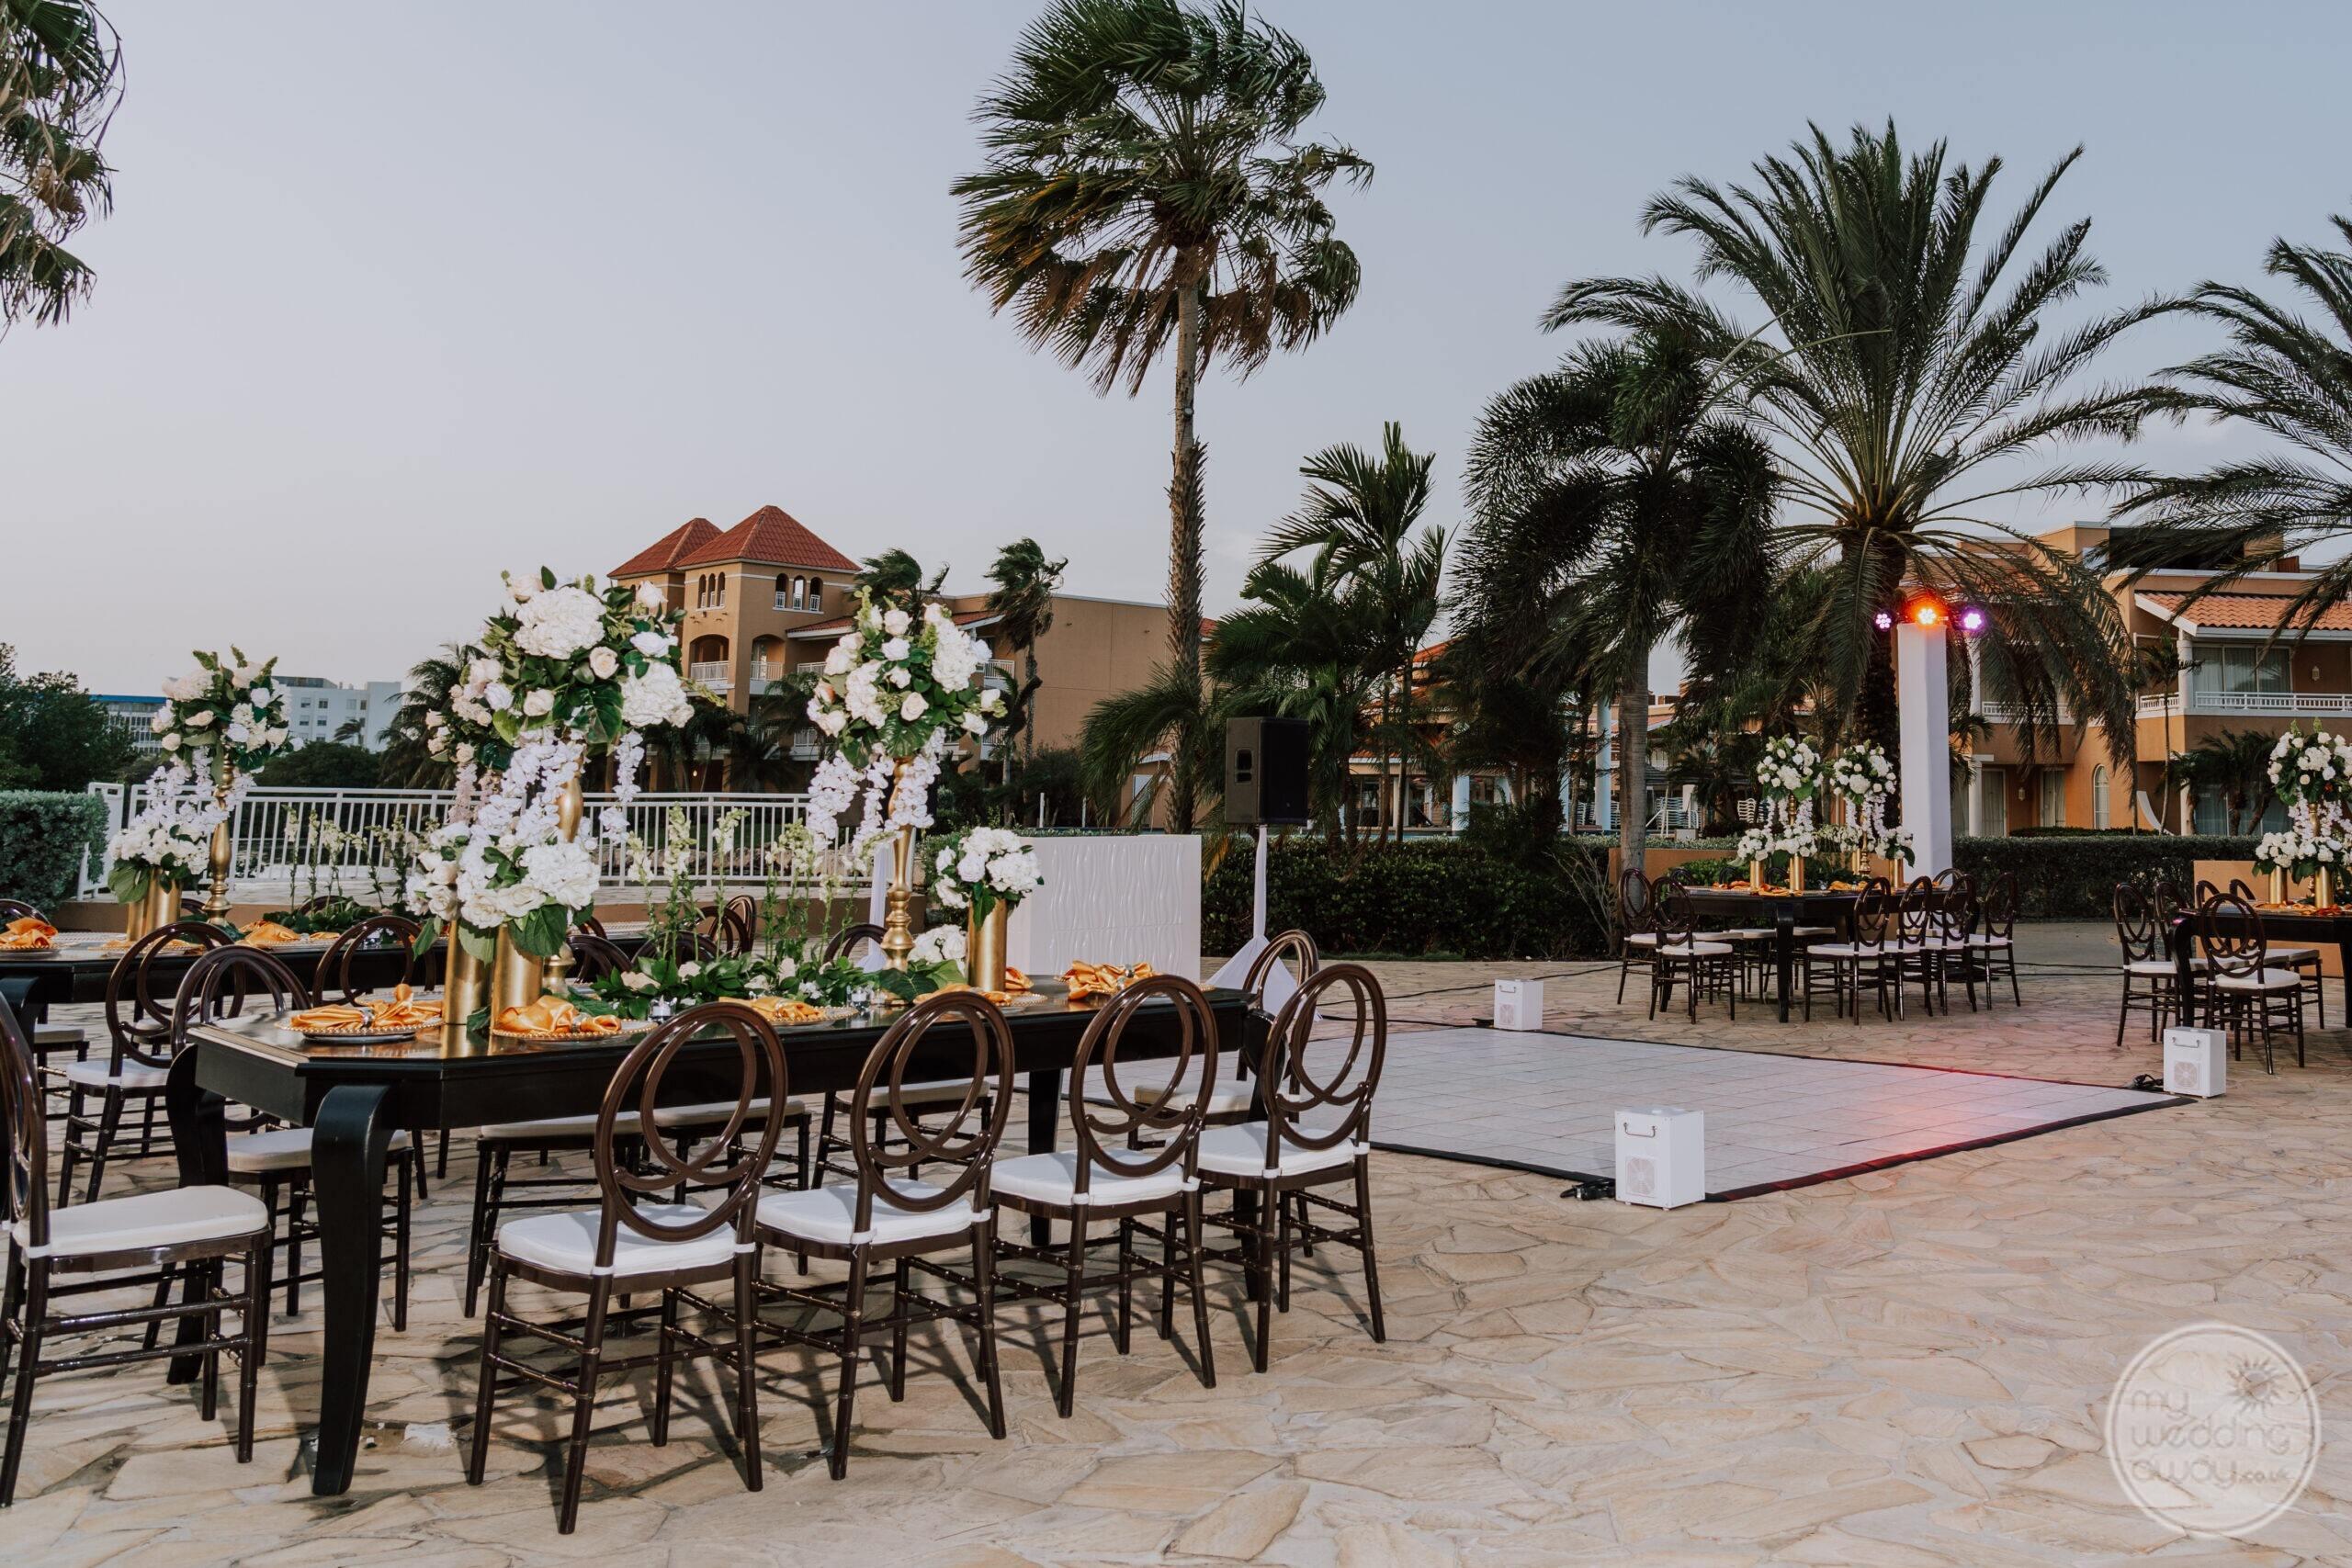 Club-plaza-Divi-resorts-Aruba-wedding-receptions